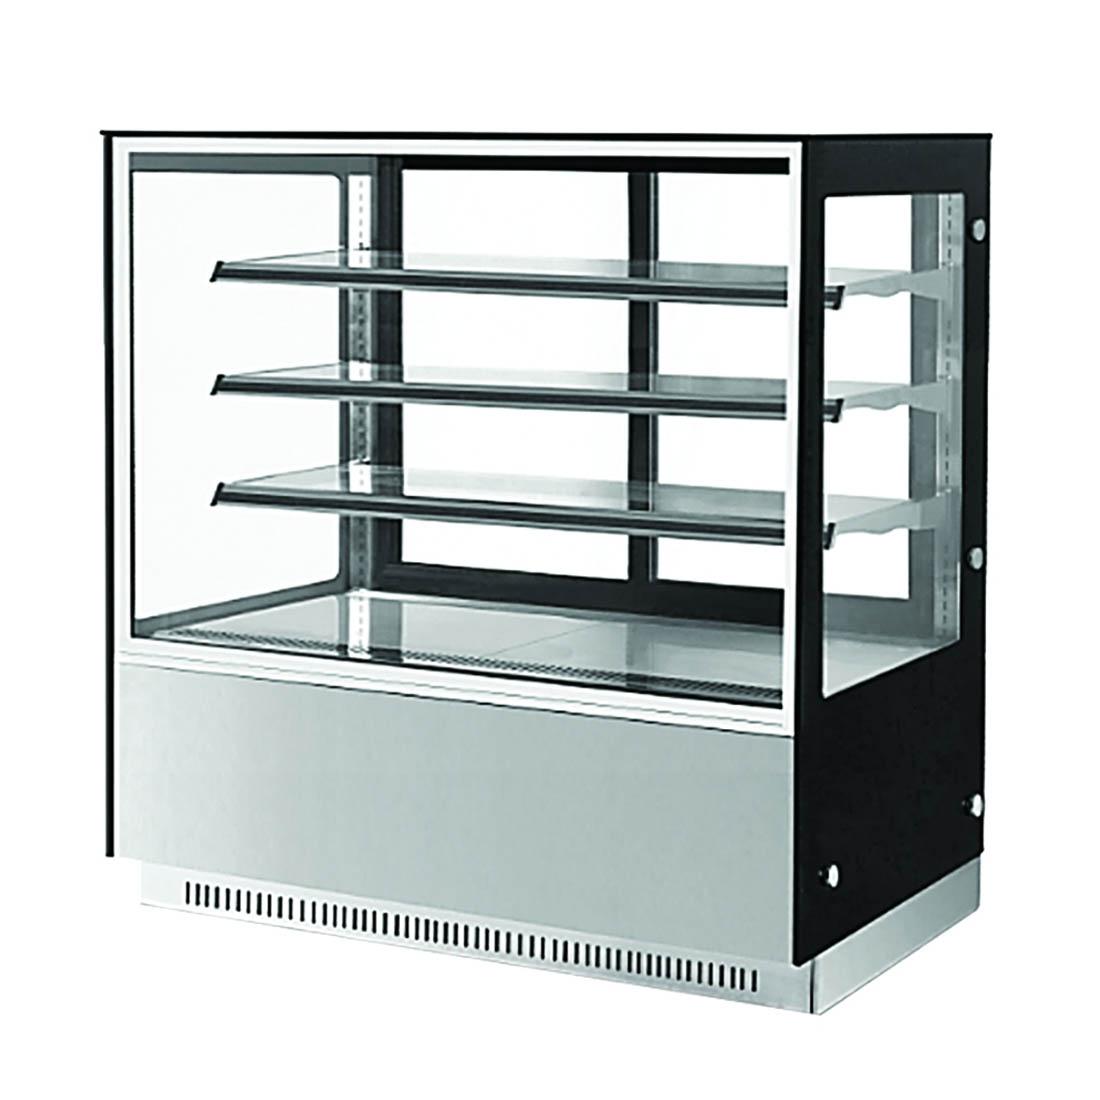 Modern 3 Shelves Cake or Food Display - GN-1200RF3